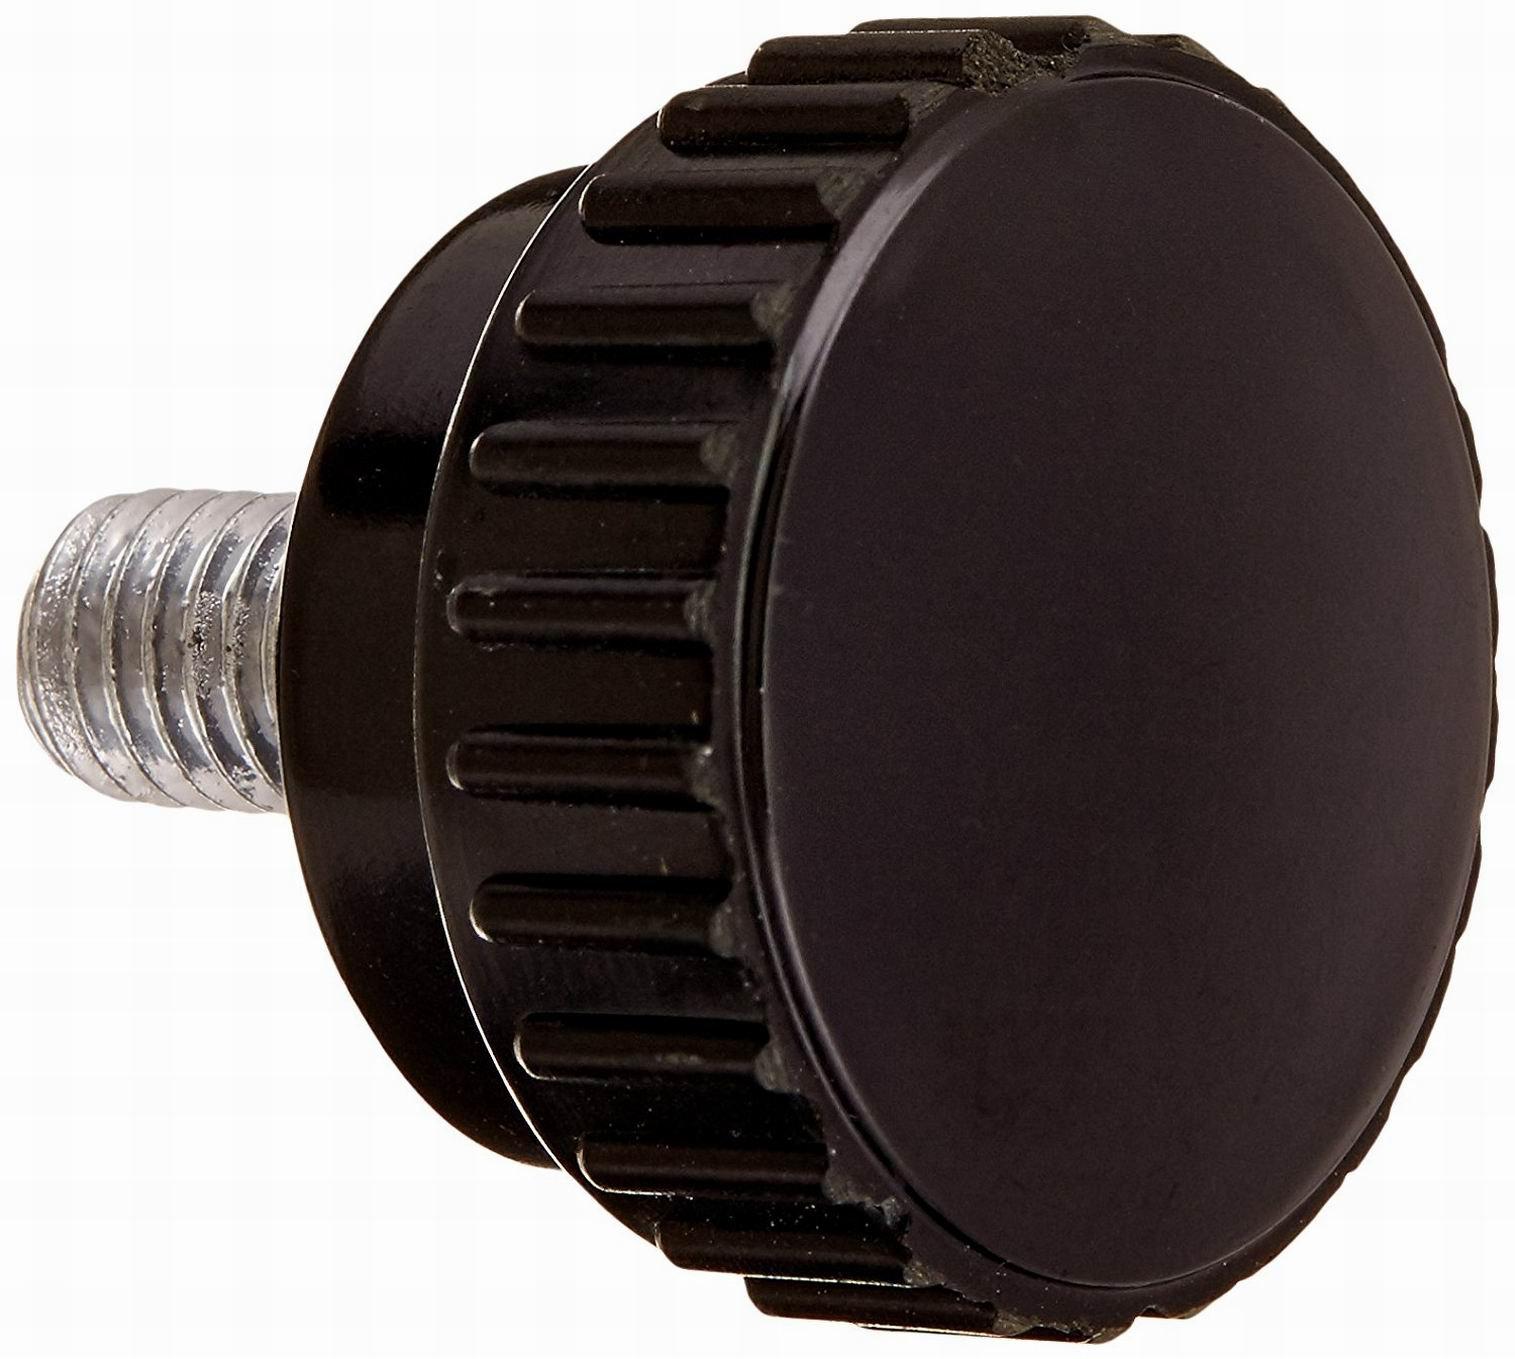 Houseuse 10Pcs 30mm Head M8 x 15mm Male Thread Screw On Type Knurled Knob,